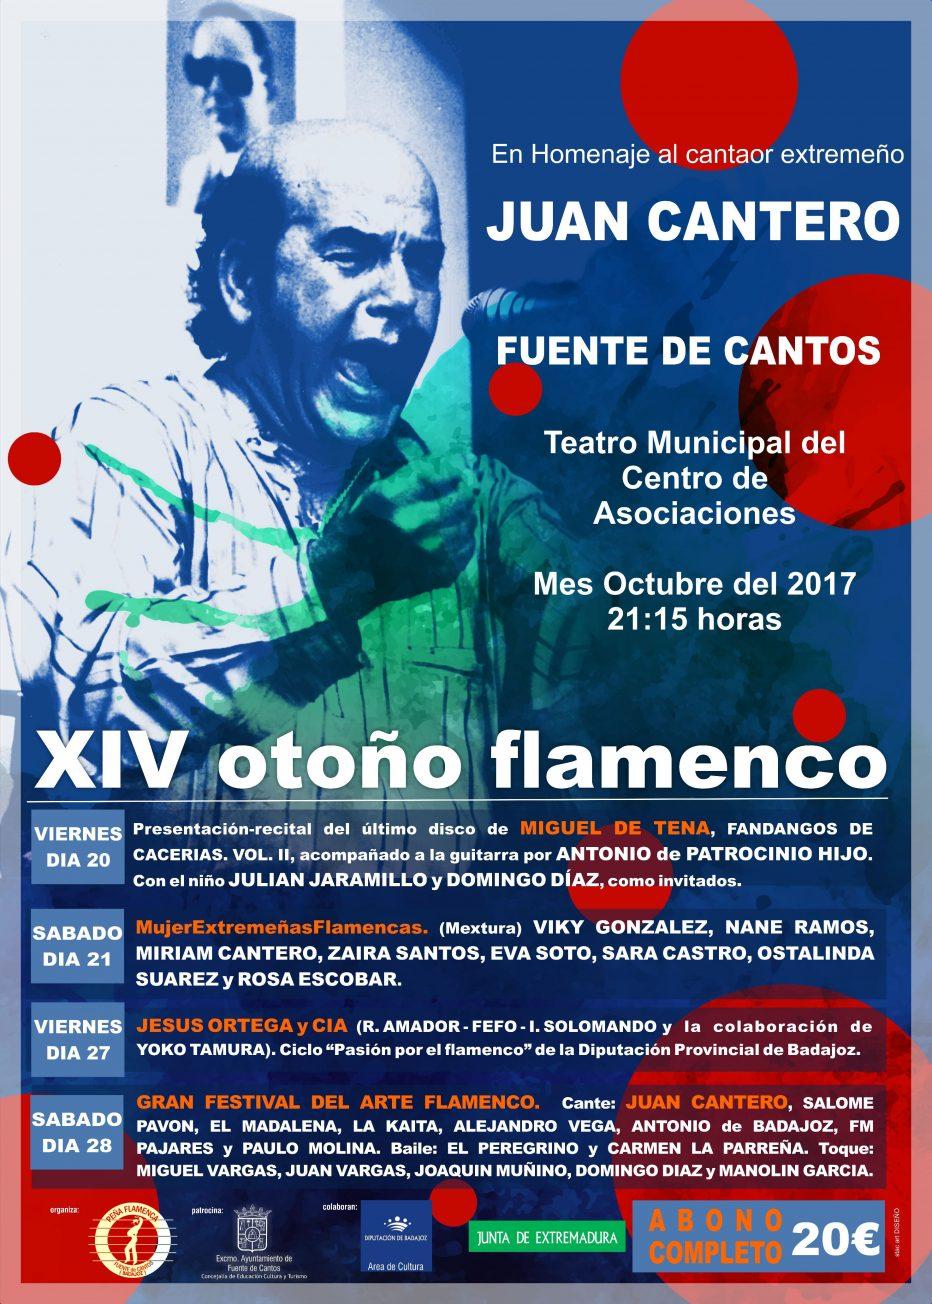 Otoño Flamenco 2017